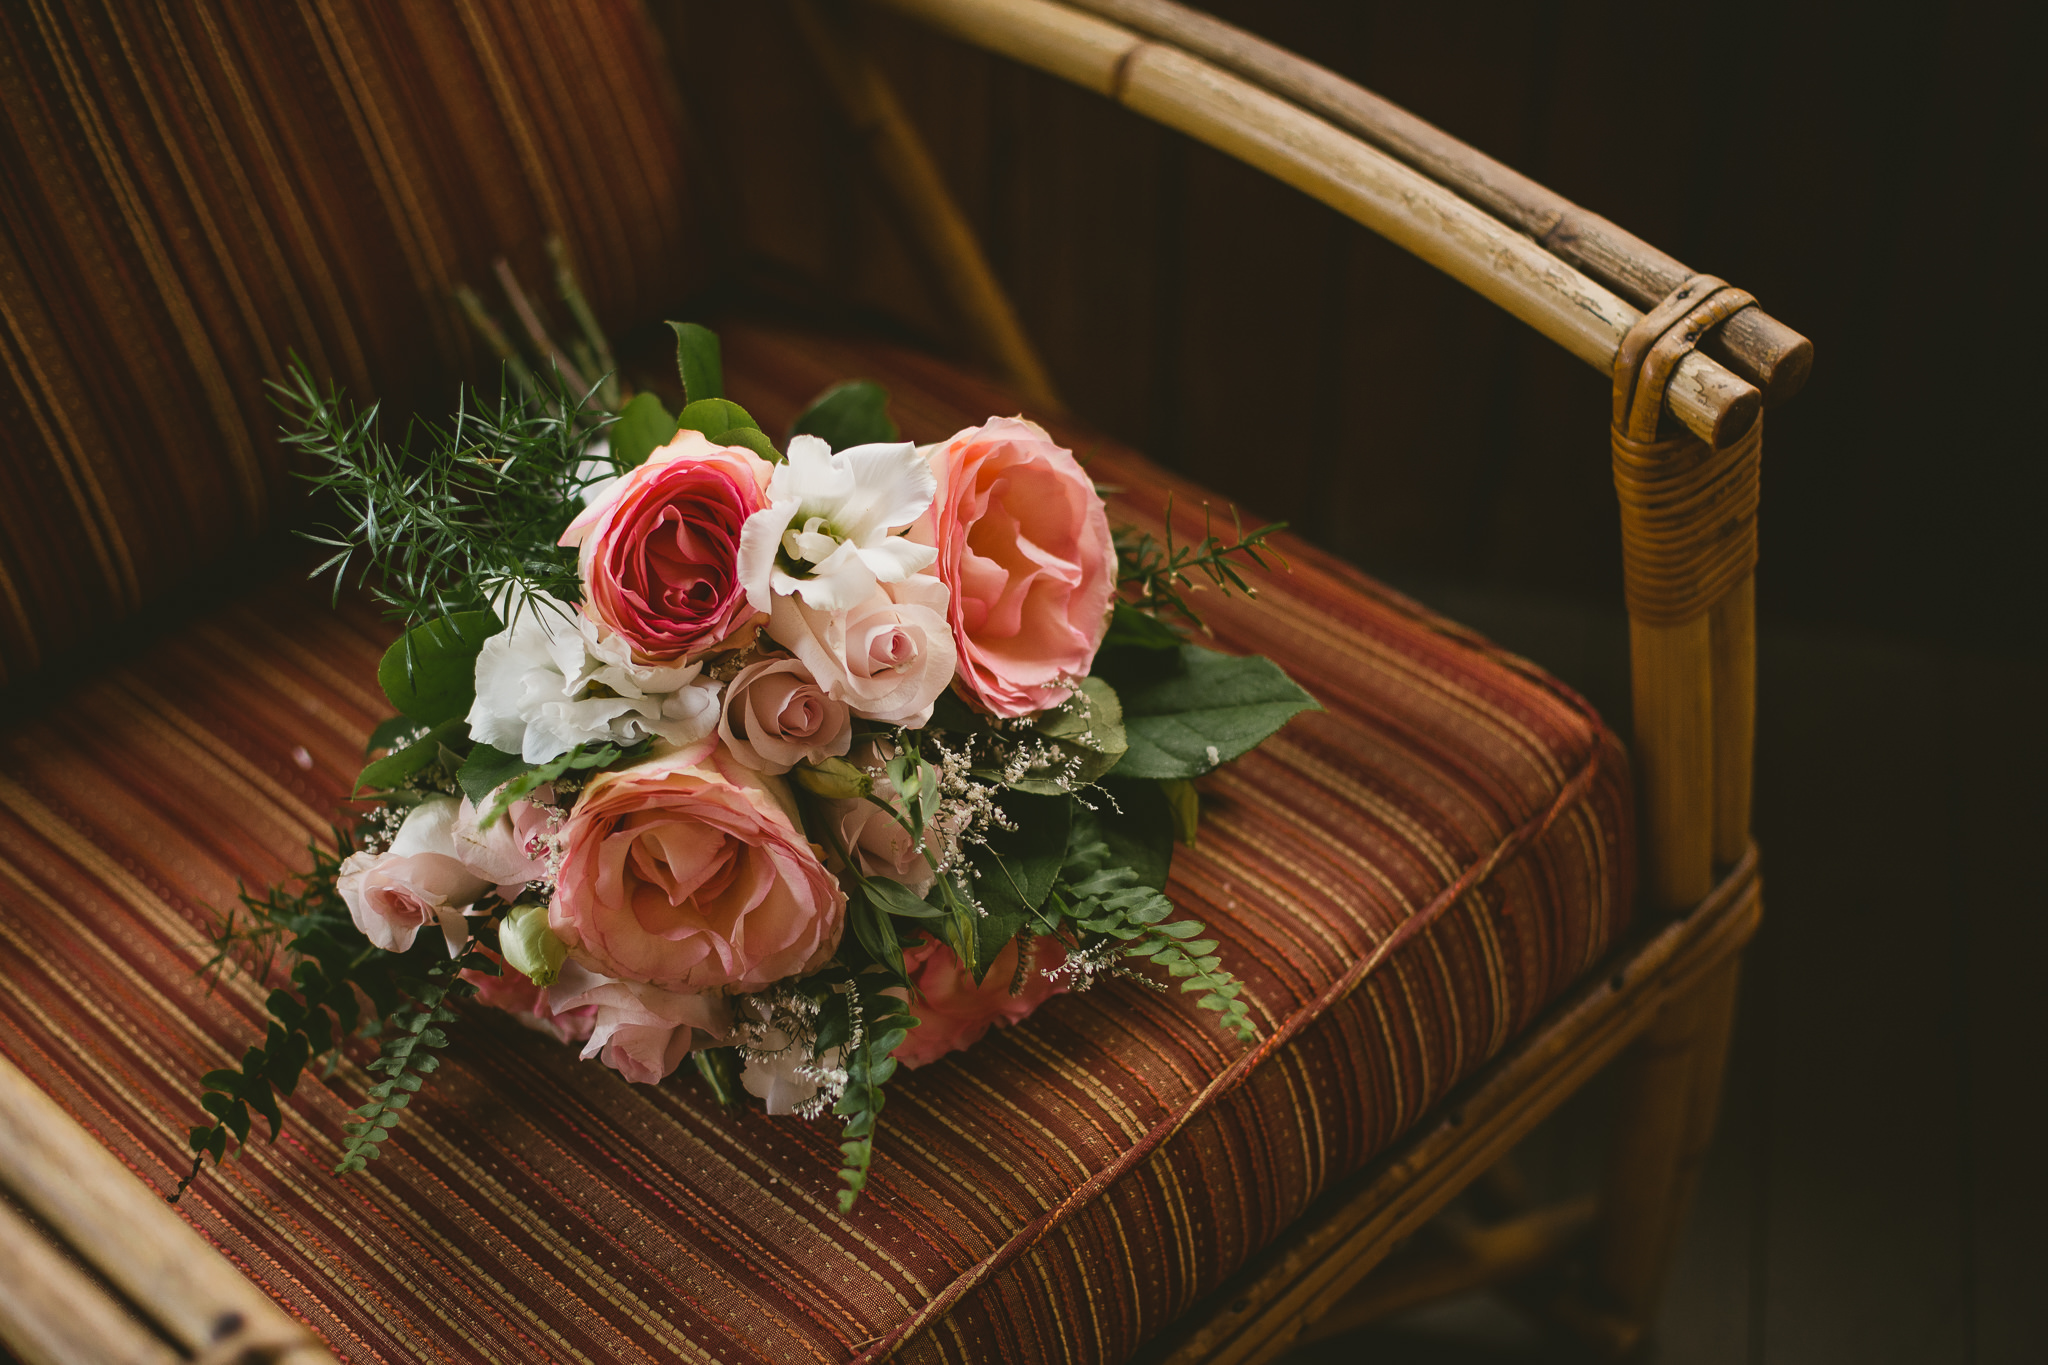 avoiding wedding season burnout, avoiding wedding photography burnout, how to avoid burnout, how to avoid wedding photography burnout